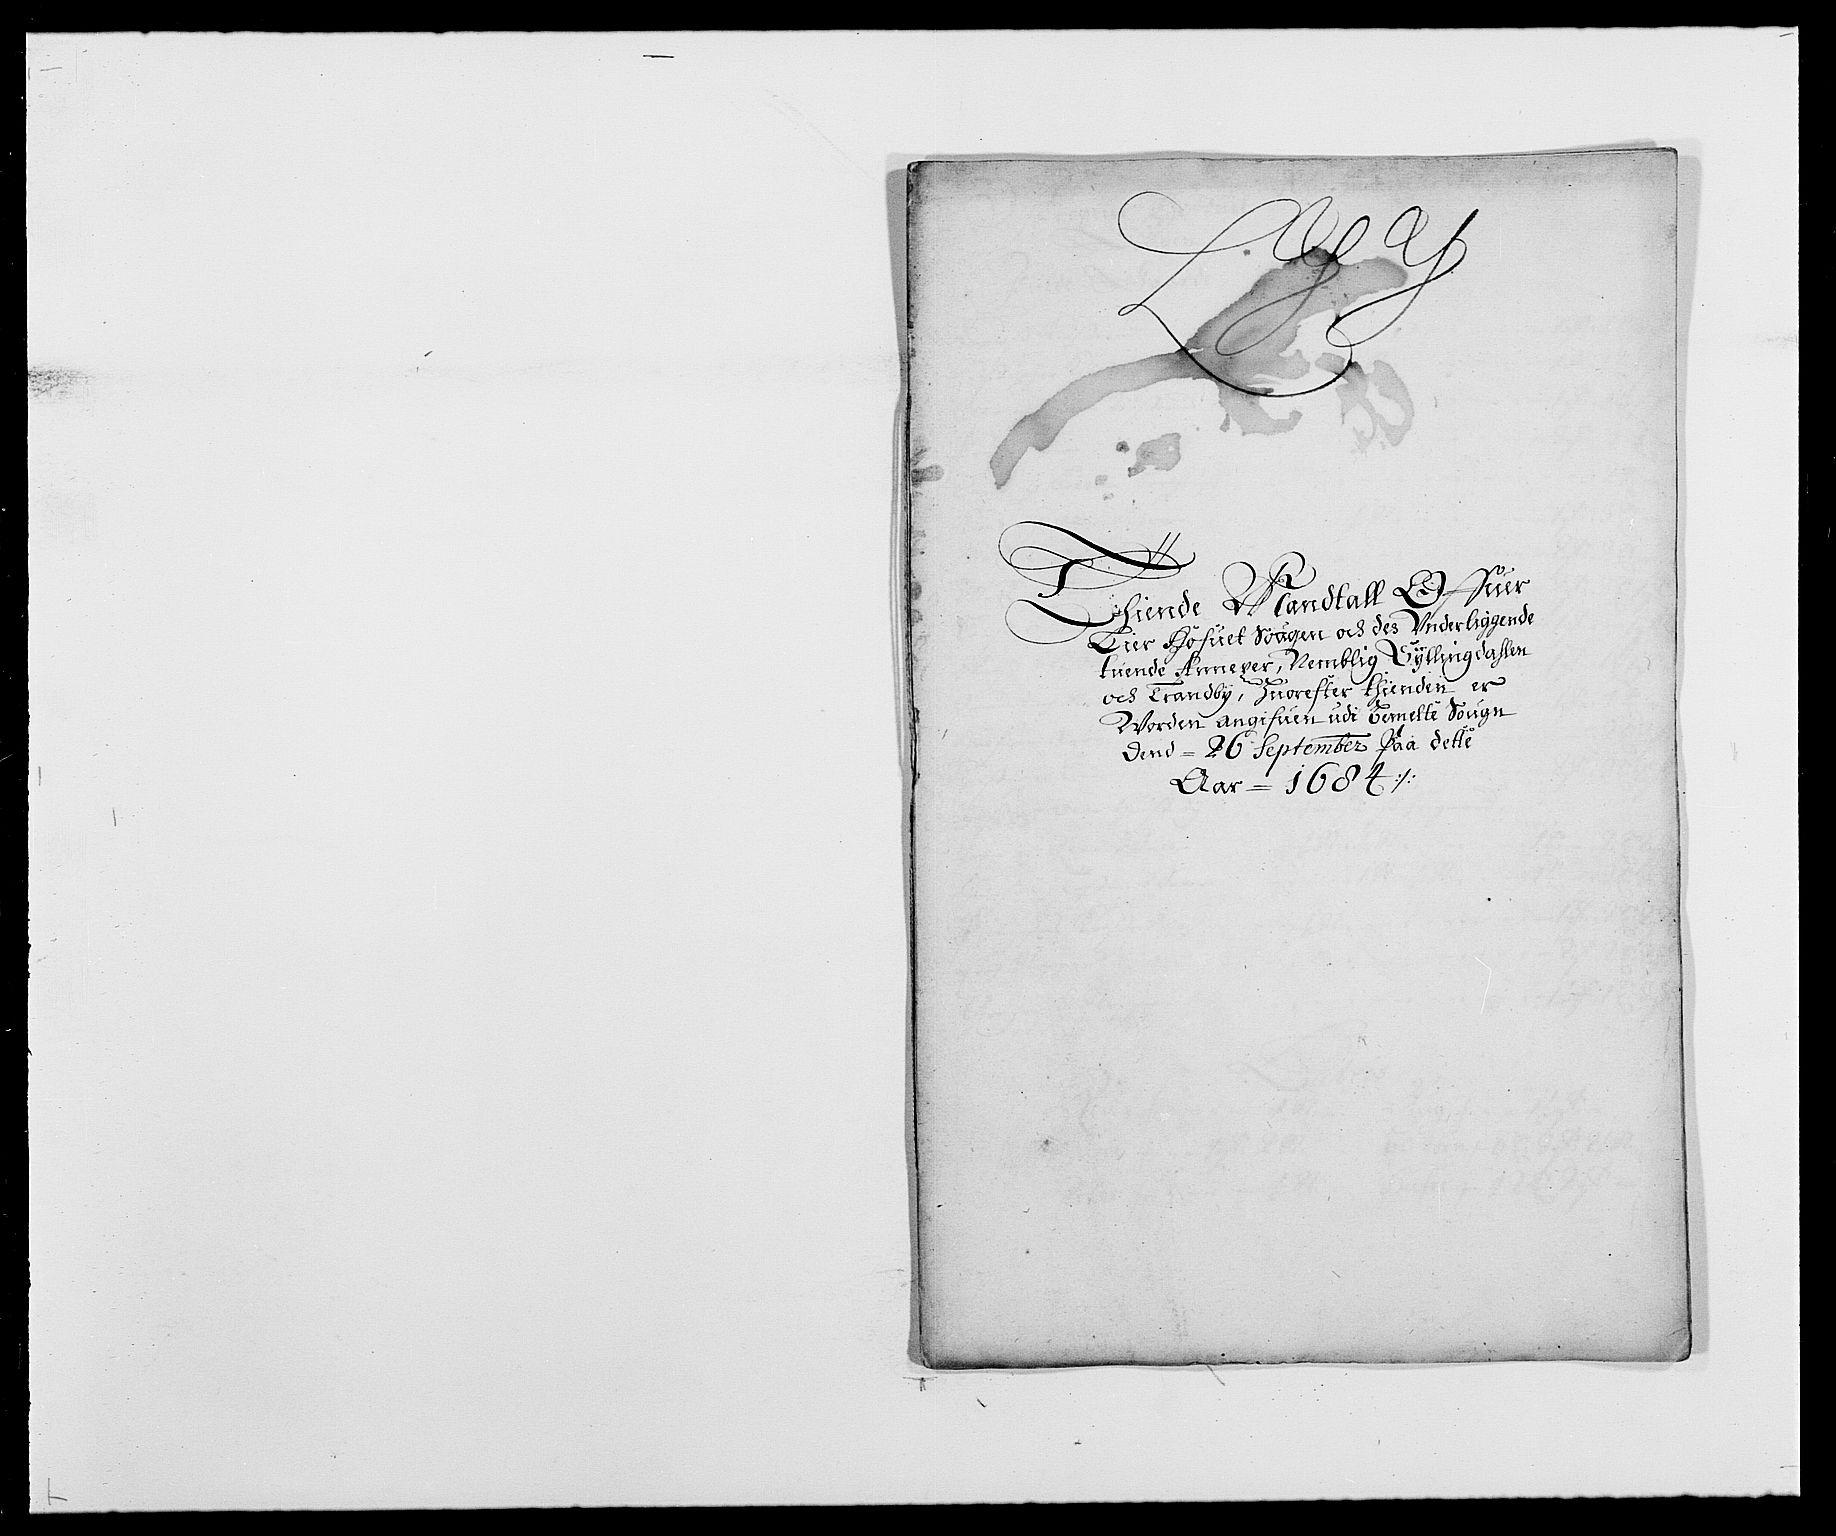 RA, Rentekammeret inntil 1814, Reviderte regnskaper, Fogderegnskap, R27/L1687: Fogderegnskap Lier, 1678-1686, s. 75